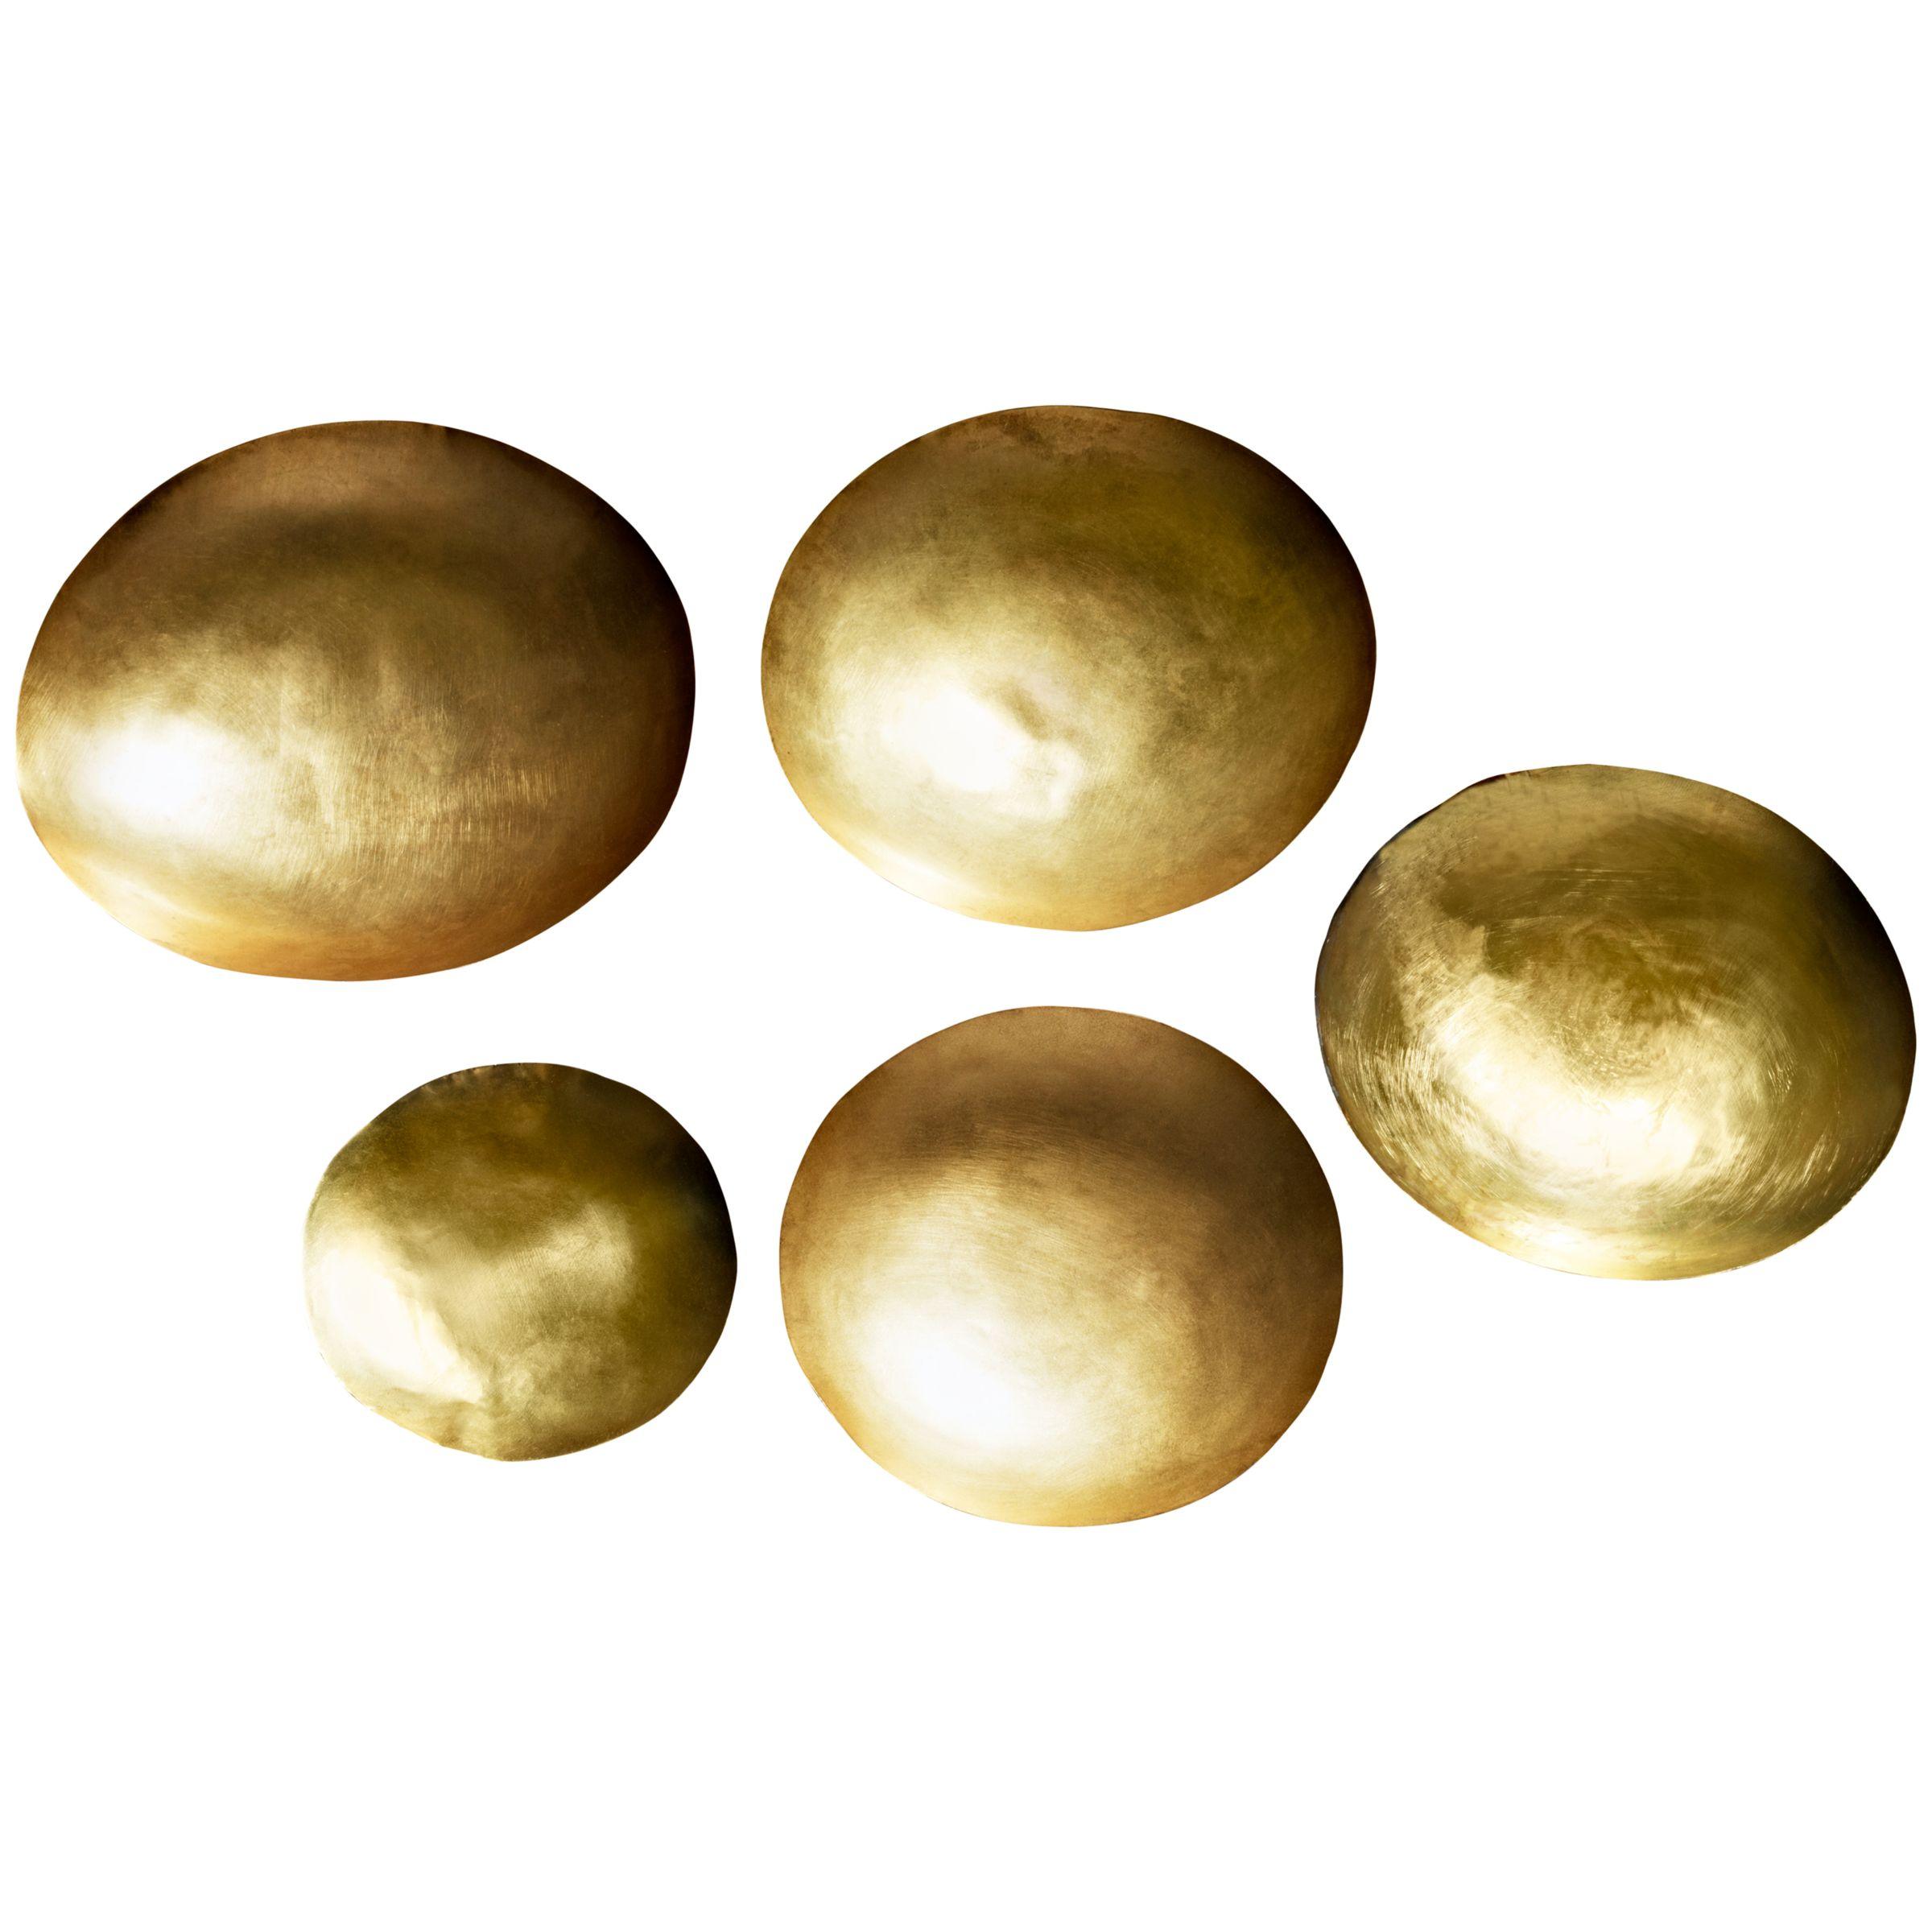 Tom Dixon Tom Dixon Form Brass Bowls, Set of 5